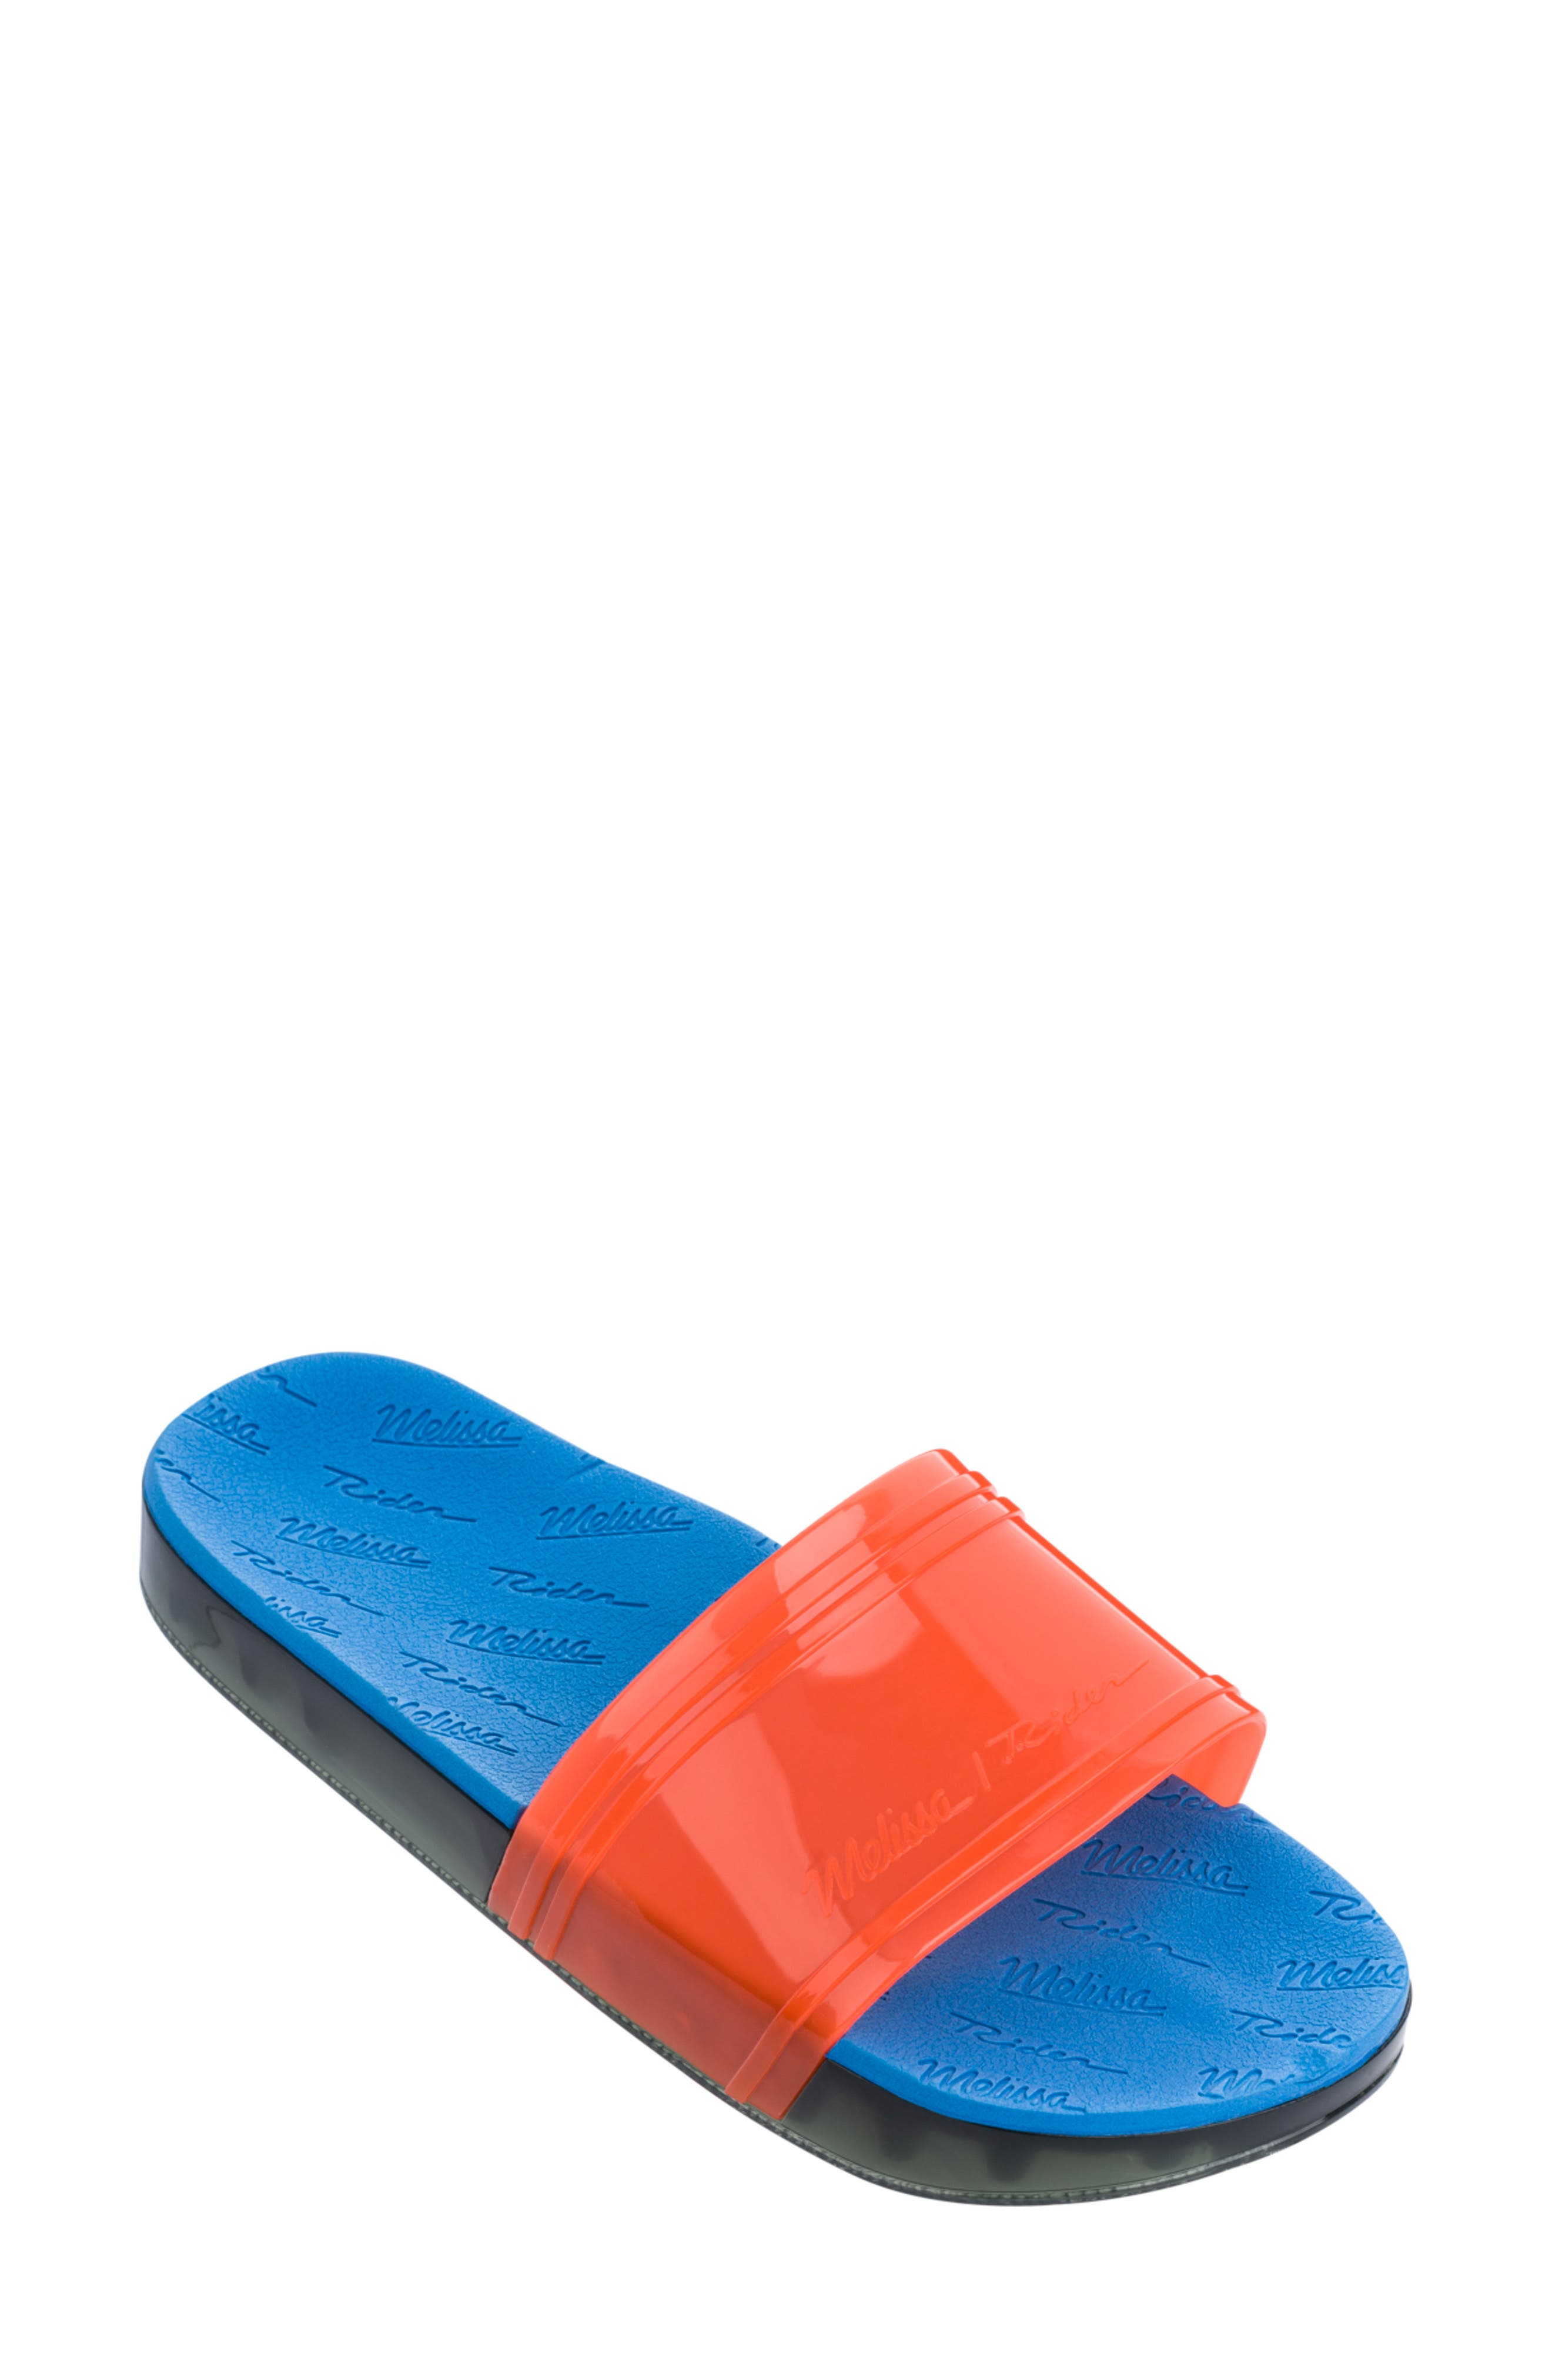 Image of Melissa Rider Sport Slide Sandal